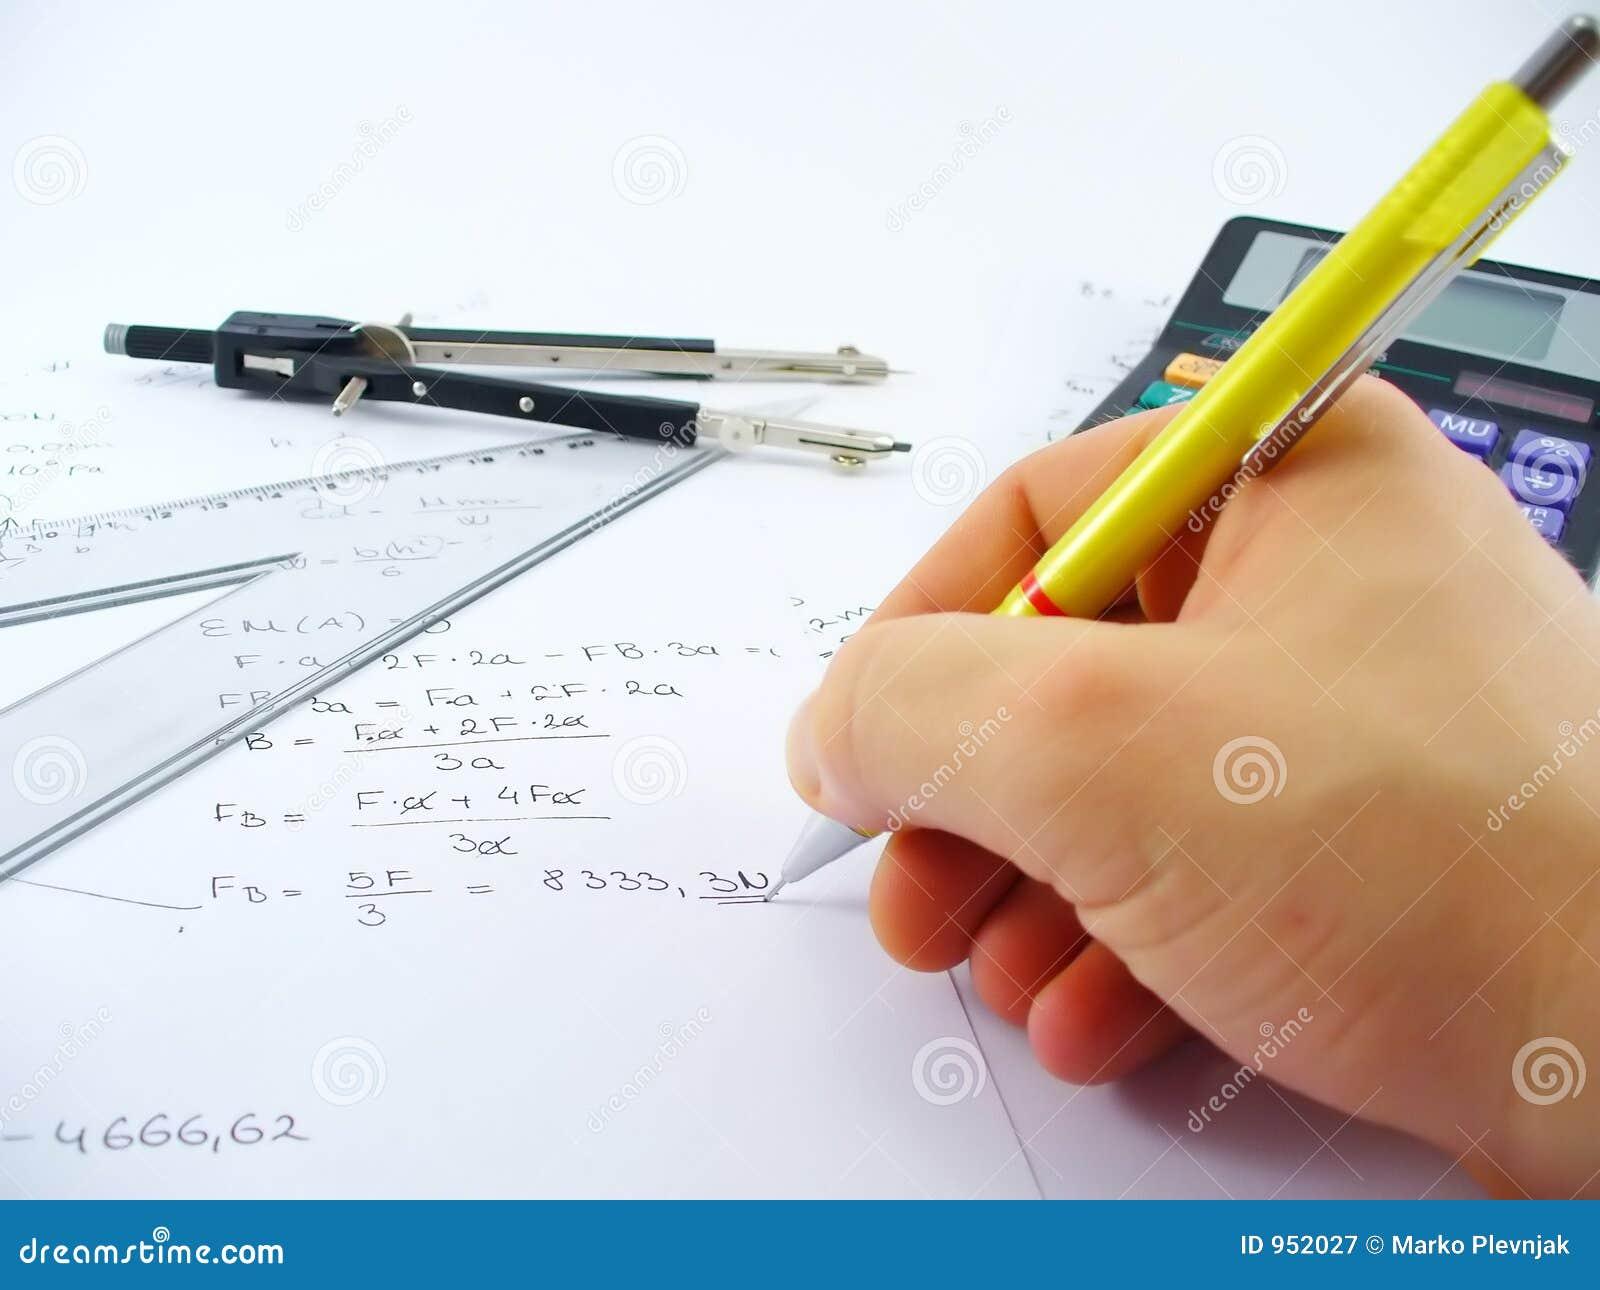 Hand solving problem